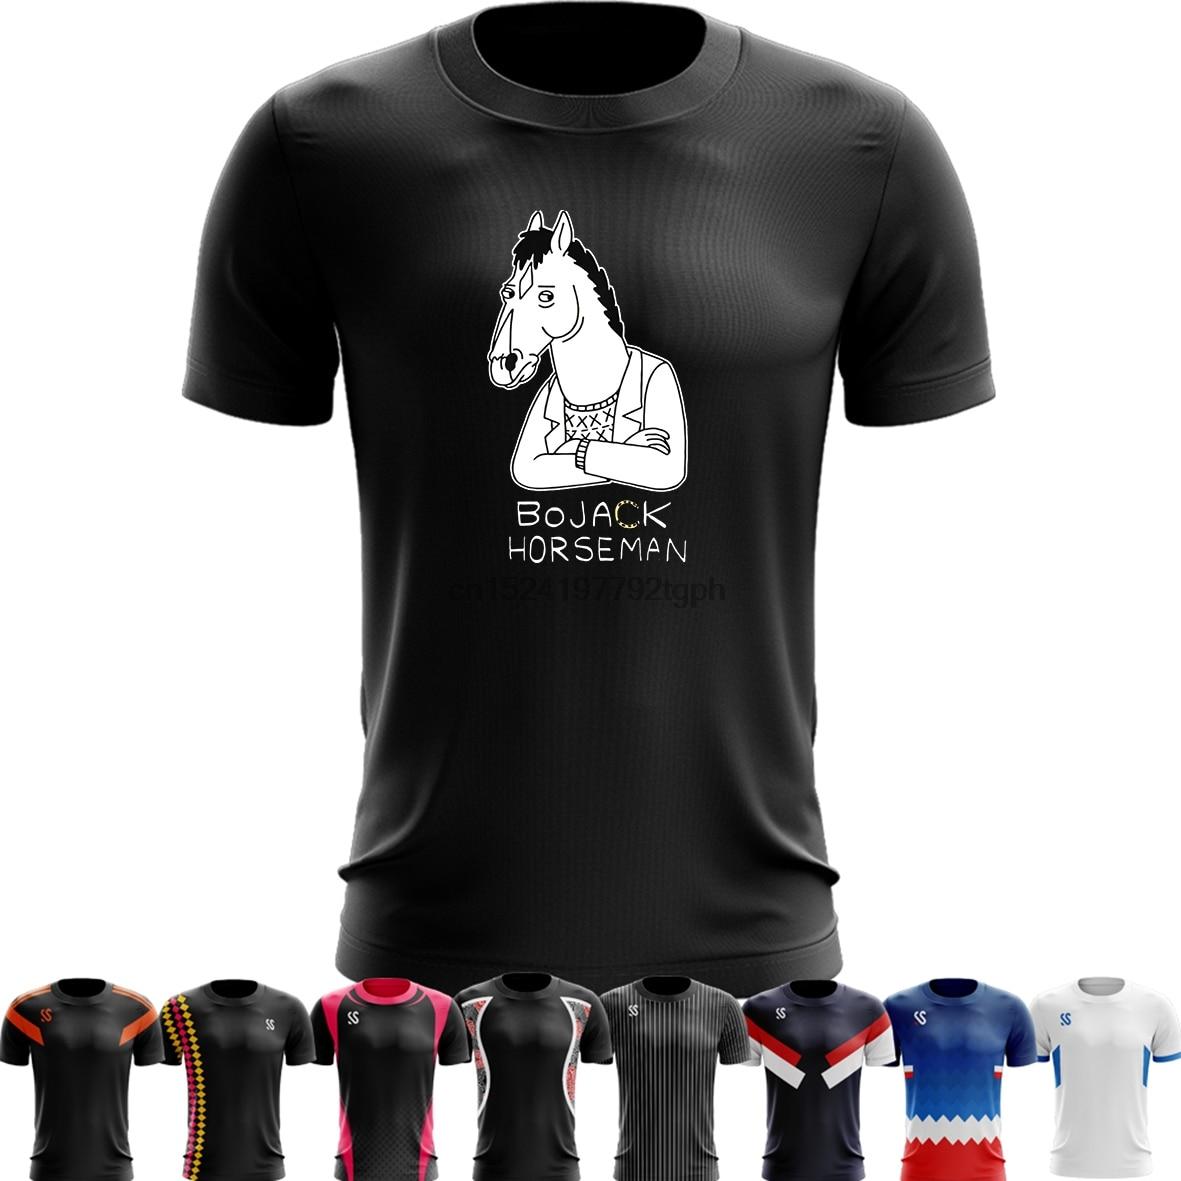 Sport Quick Dry Running Shirts Training T Shirt Men's Cartoon Bojack Horseman Punk Rock Funny S Casual Dress Printed Tops